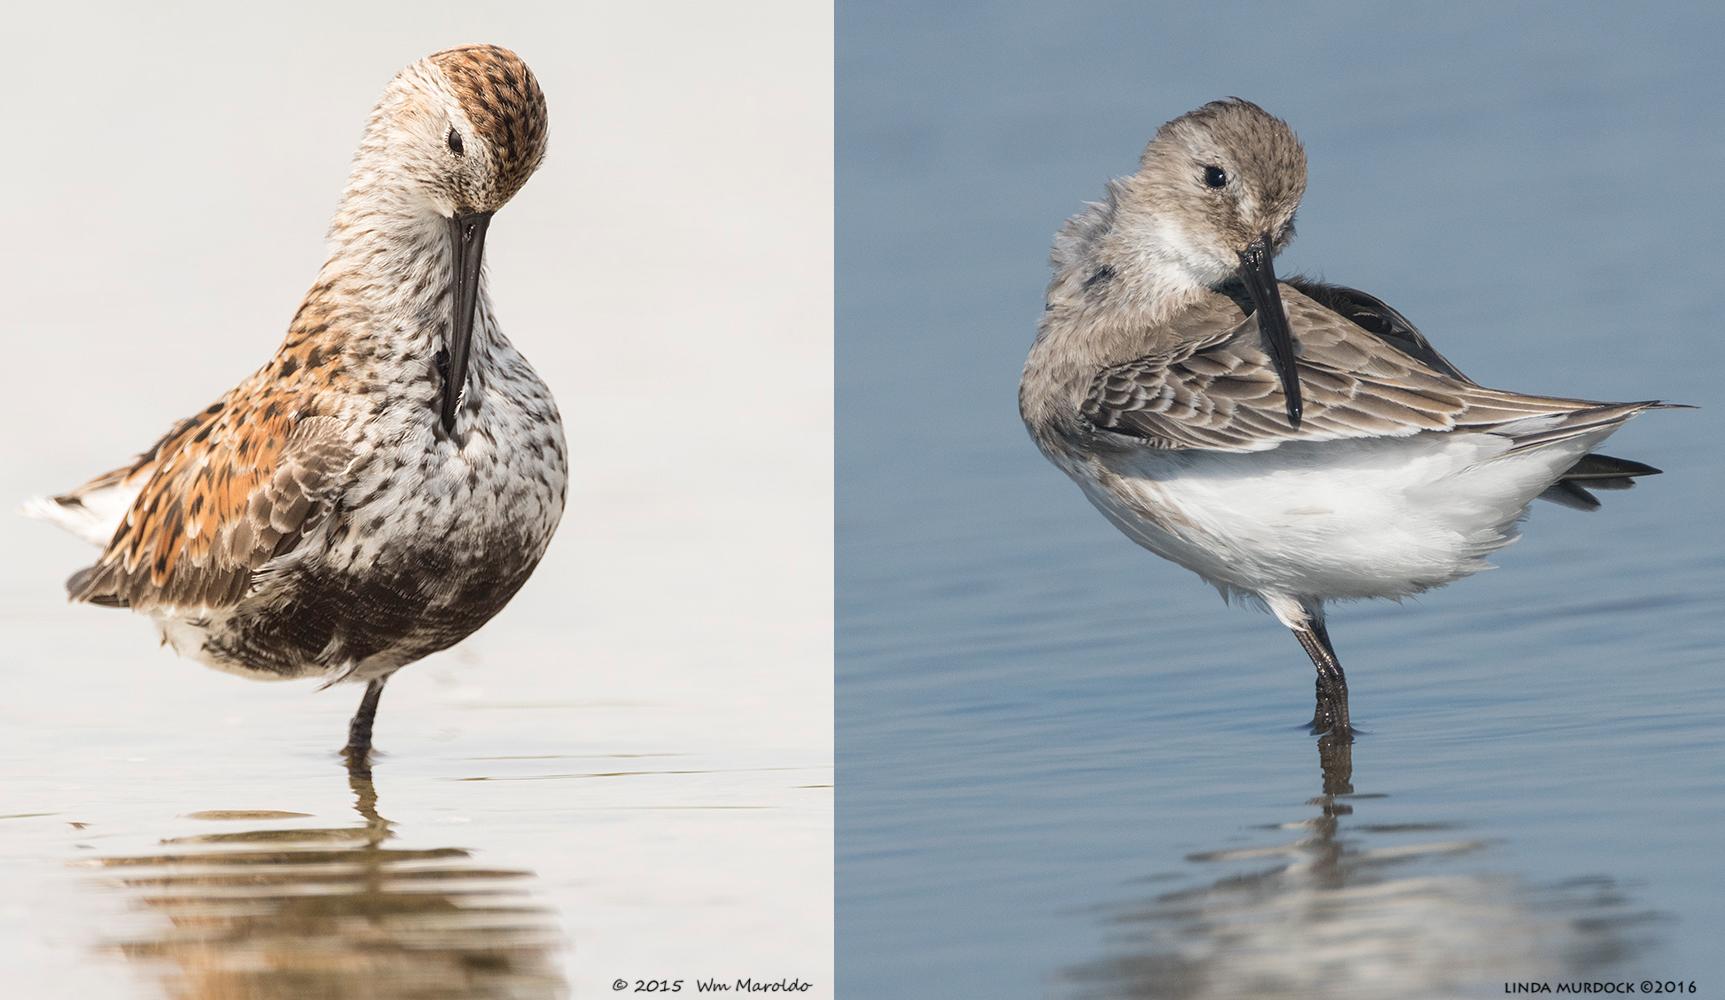 Dunlin in breeding plumage on the left, non-breeding Dunlin on the right